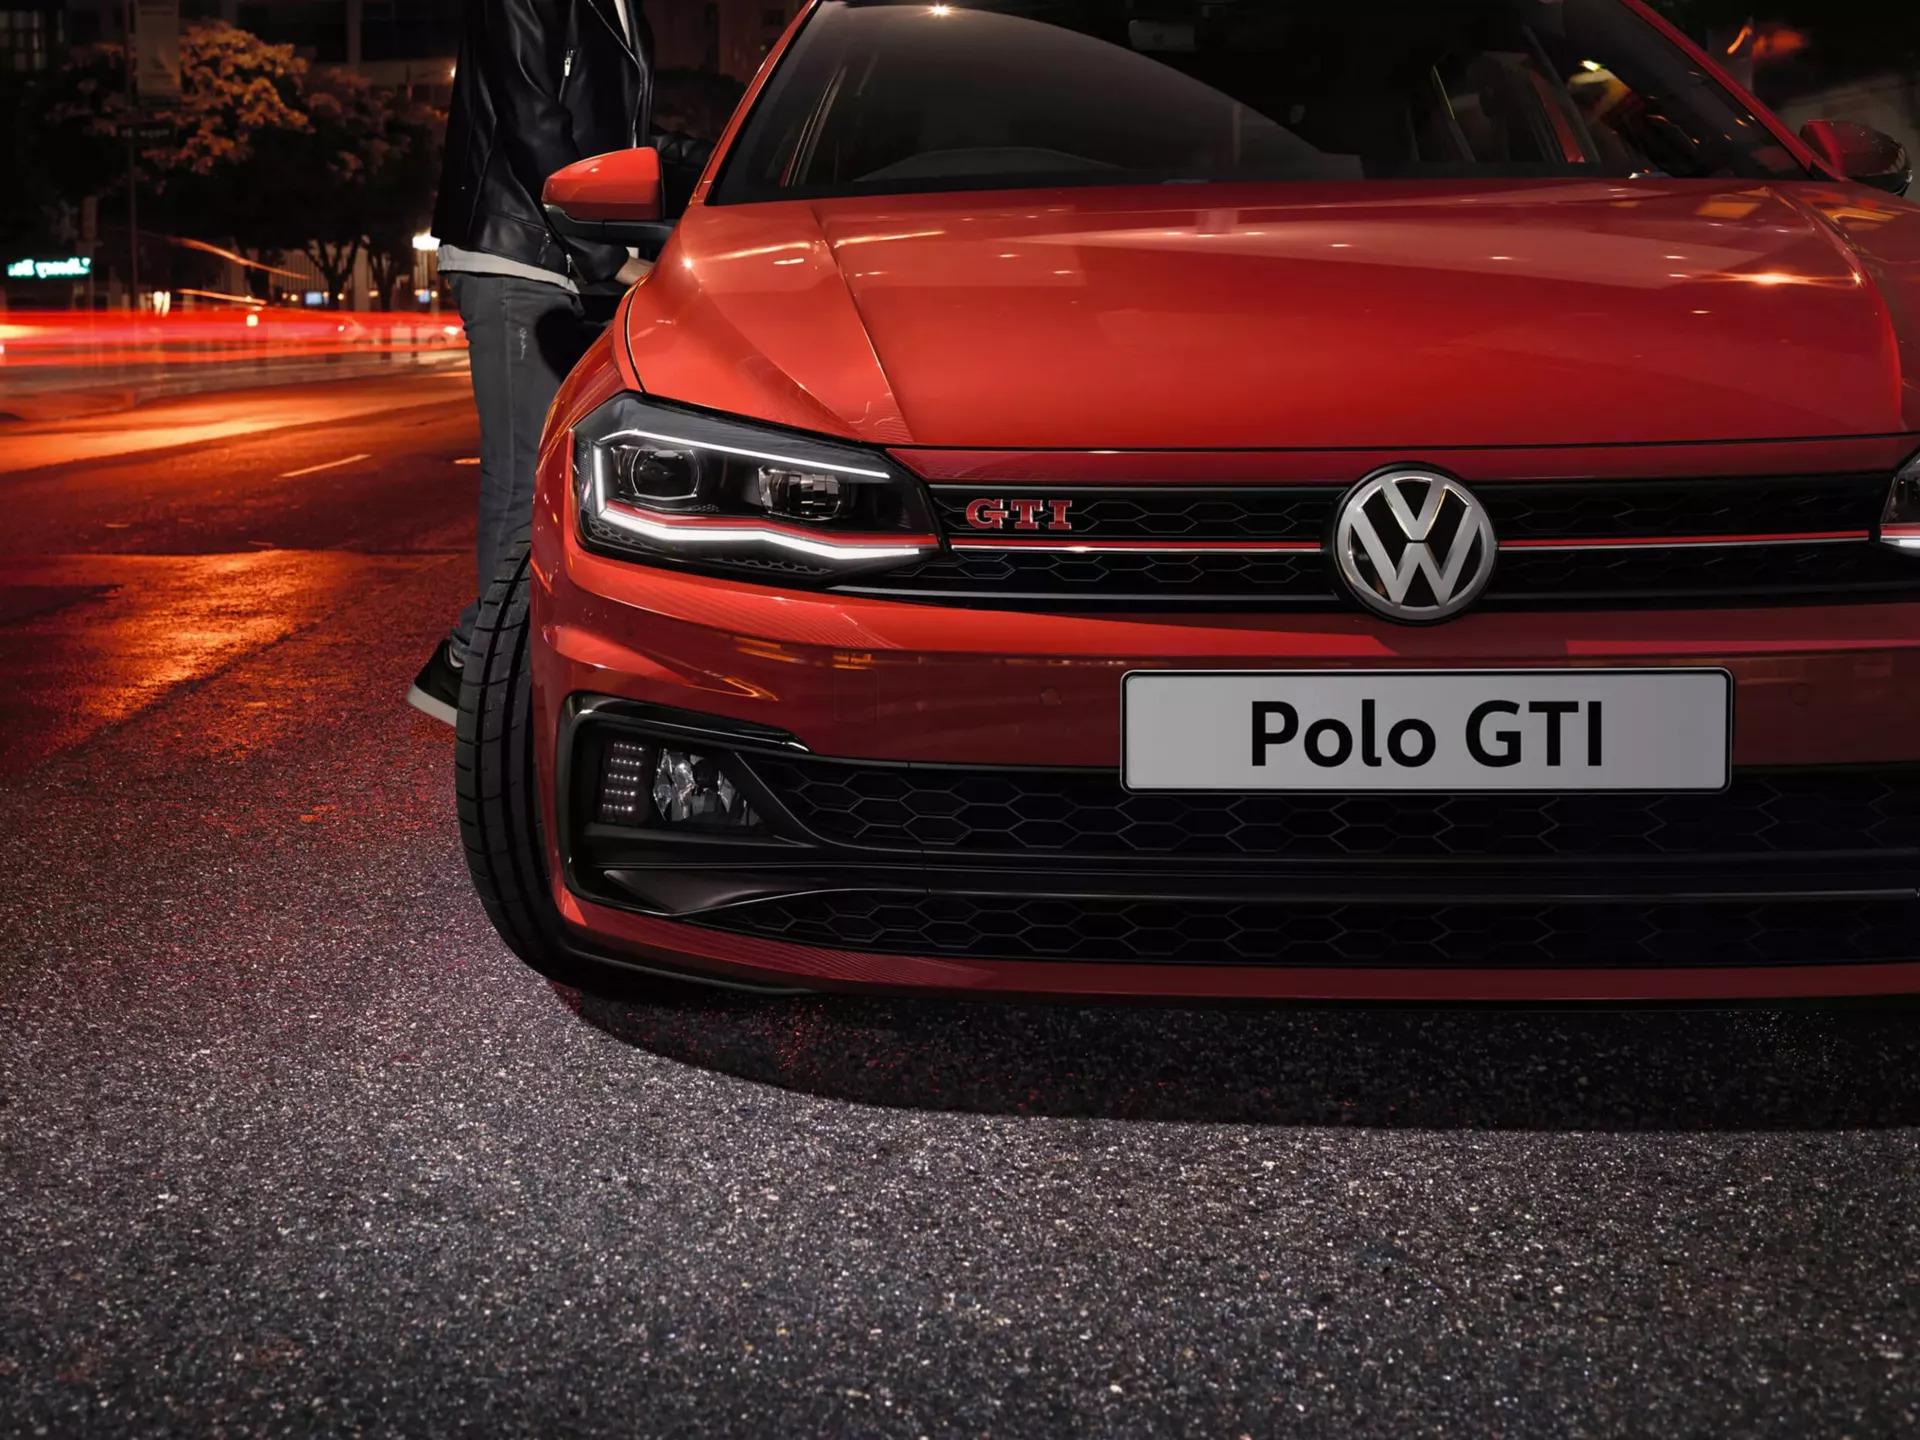 Polo GTI - Bayford Volkswagen Epping